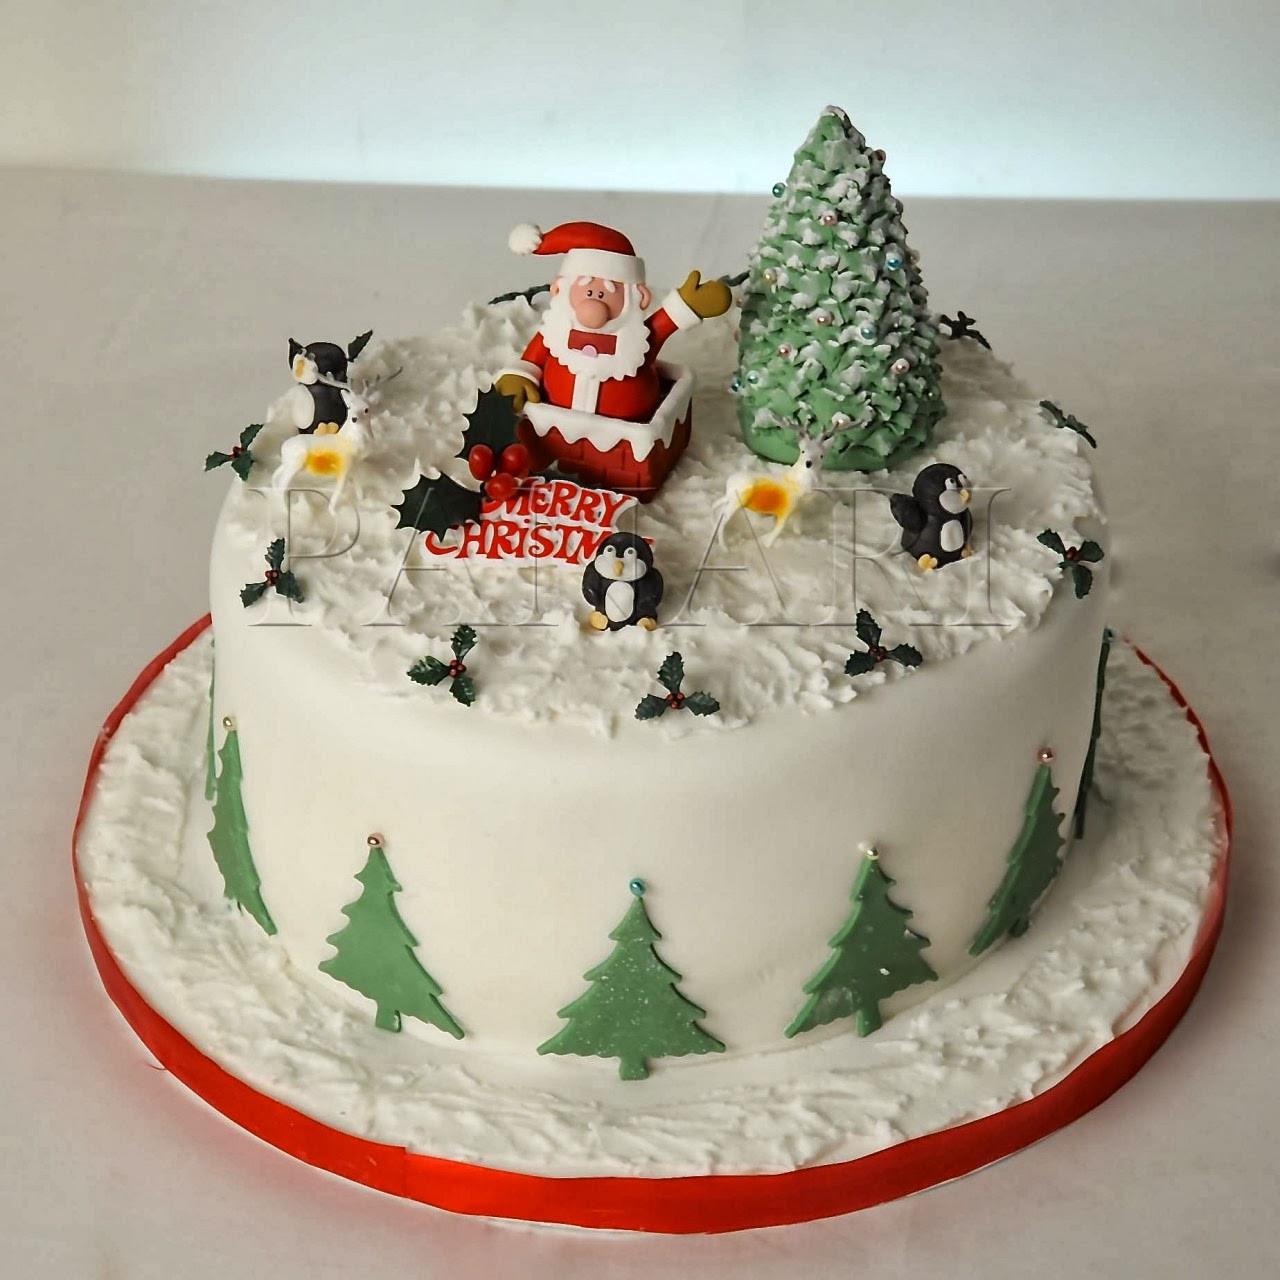 Merry Christmas Cakes  Merry Christmas Cake HD Wallpapers Blog